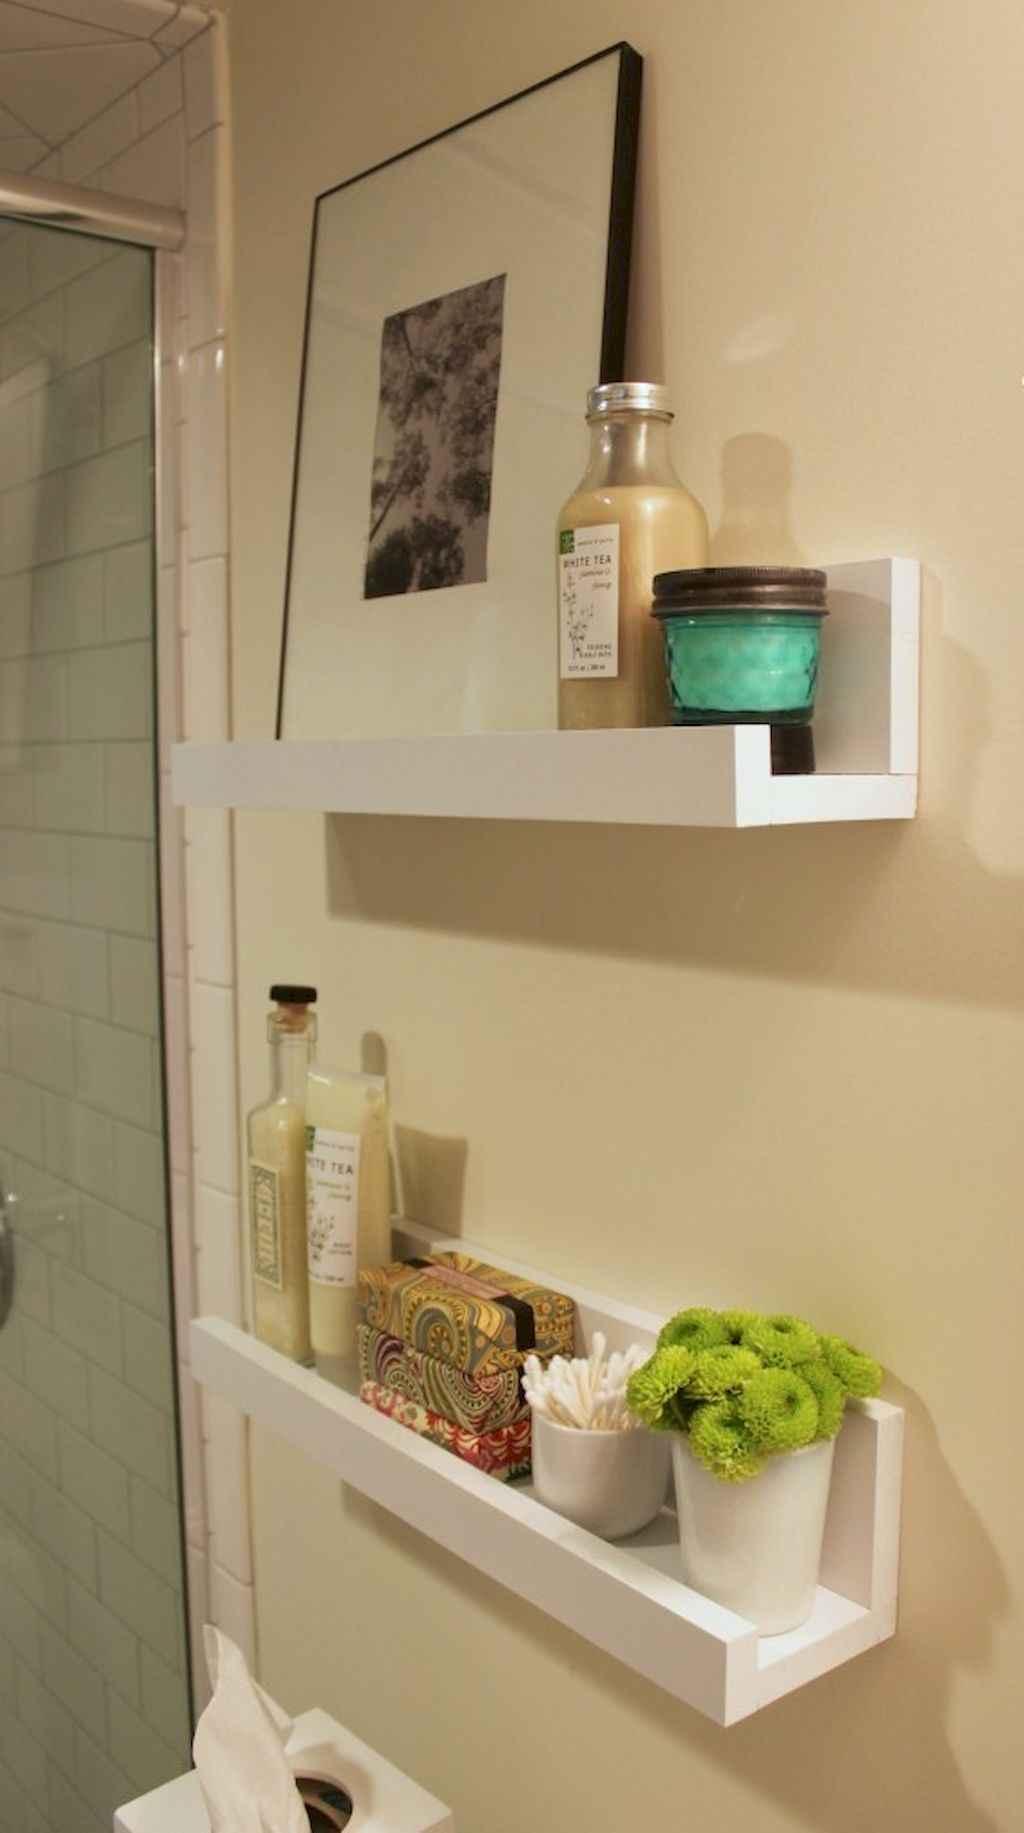 Cool bathroom storage shelves organization ideas (40)